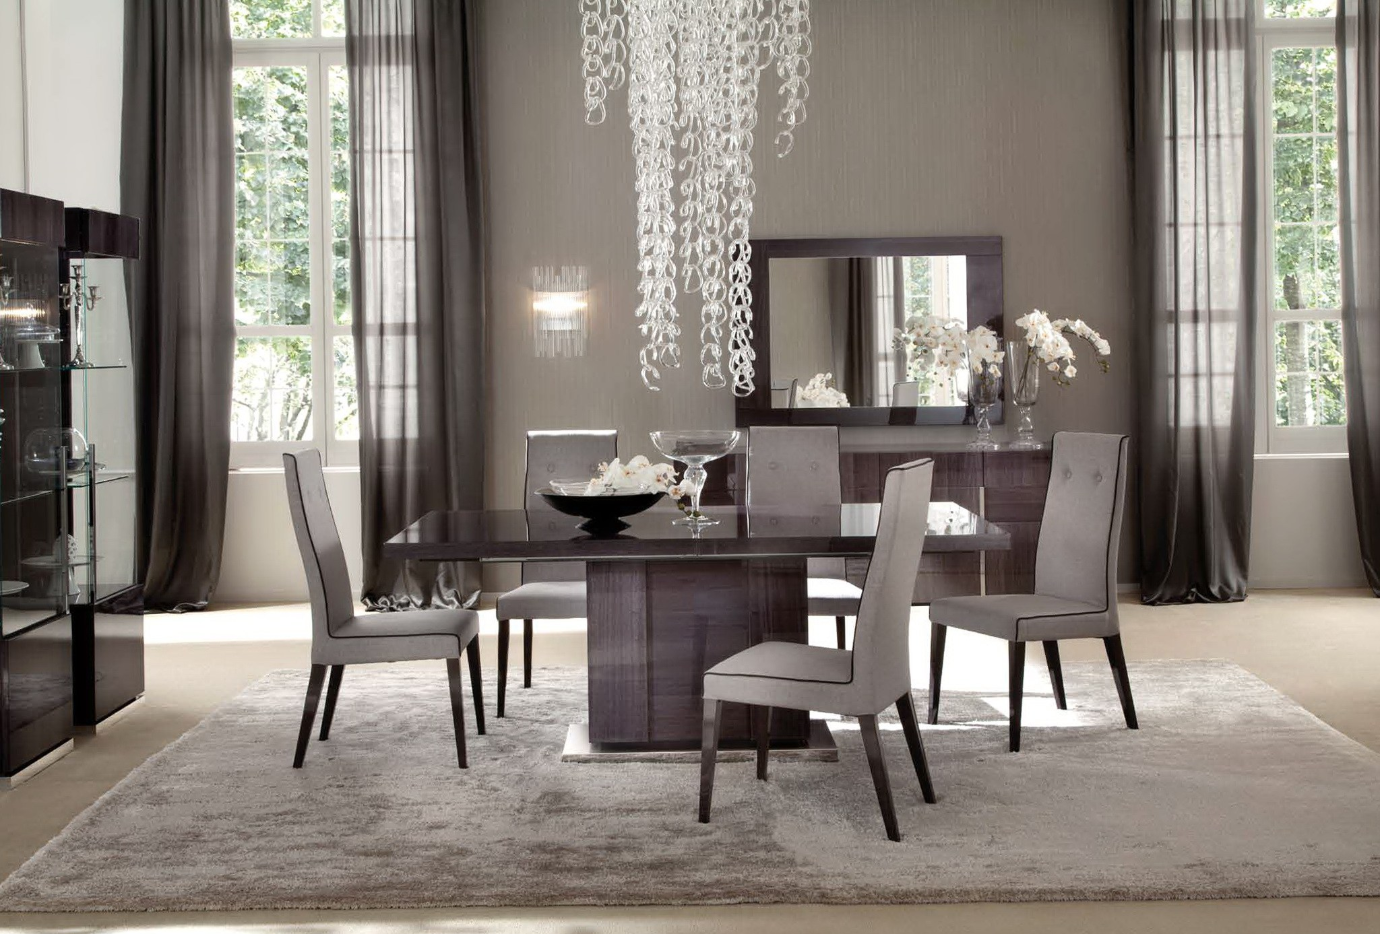 Casual Dining Room Ideas Curtains Home Design Curtain Ruang Makan Mewah Ruang Makan Modern Desain Ruang Makan